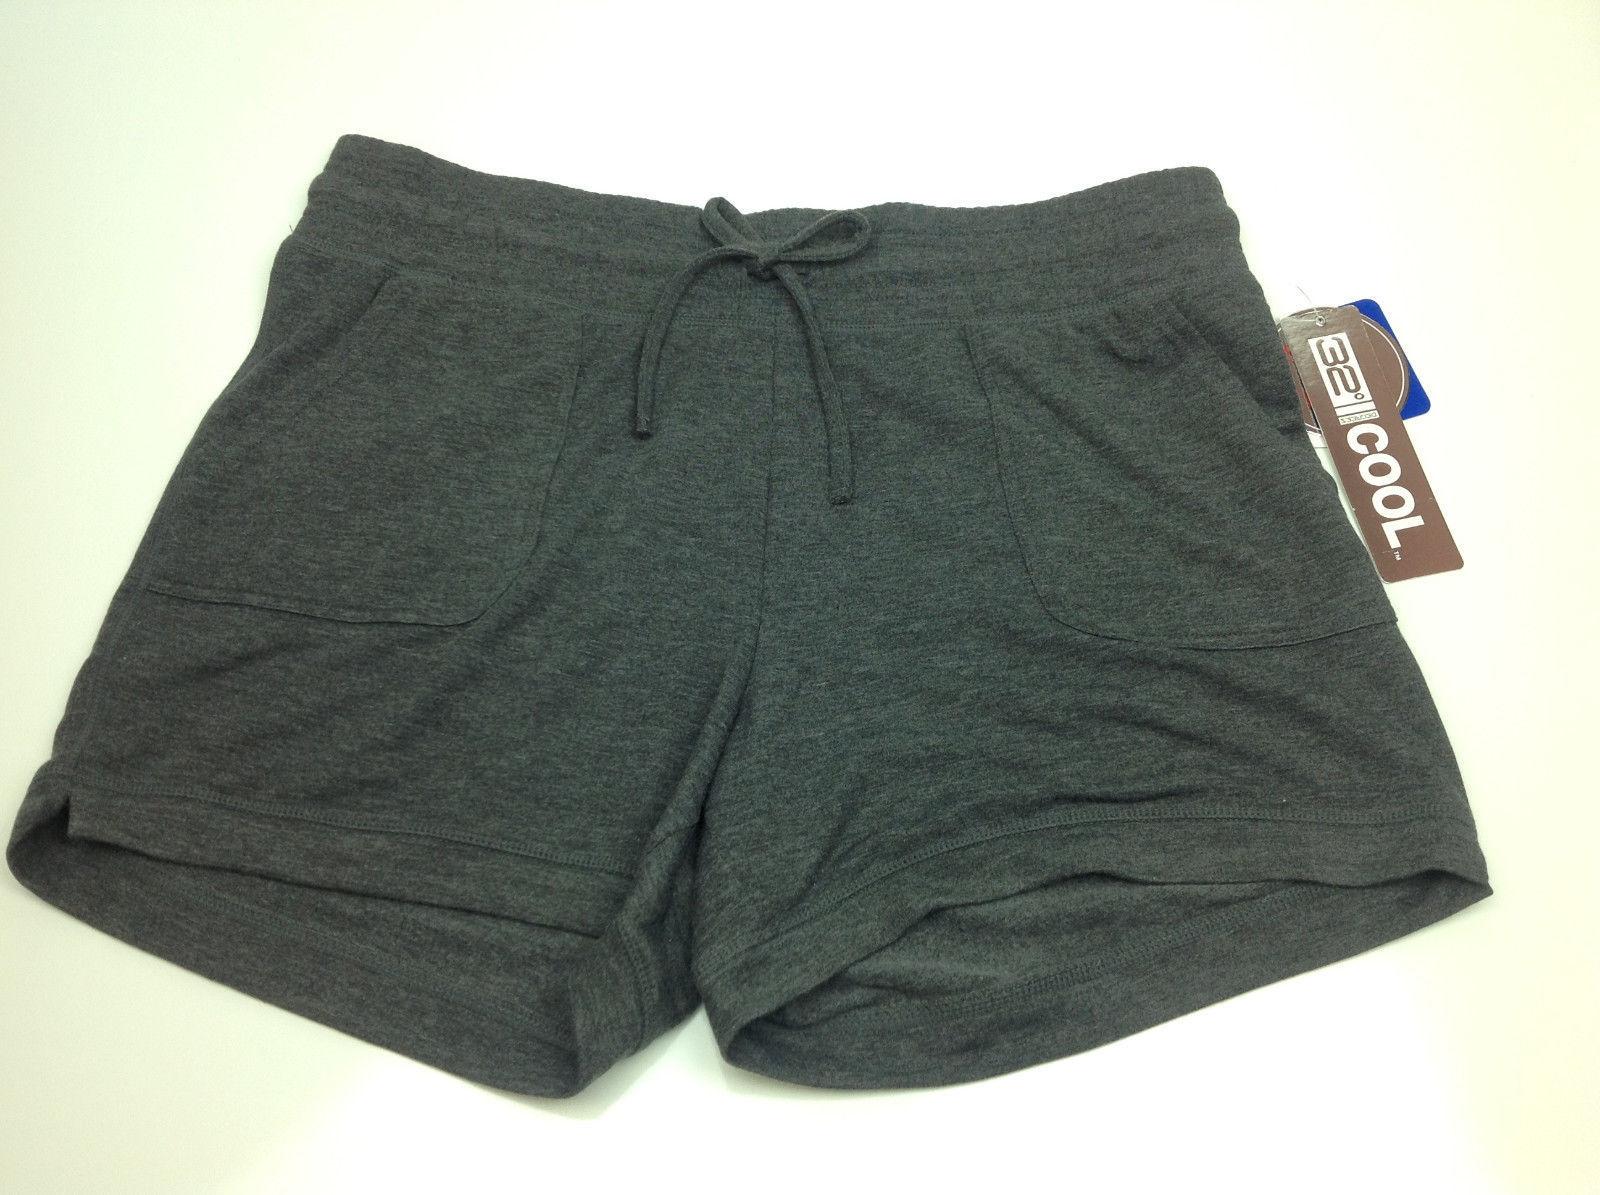 32 Degrees CoolTM Ladies' Fleece Short. image 2